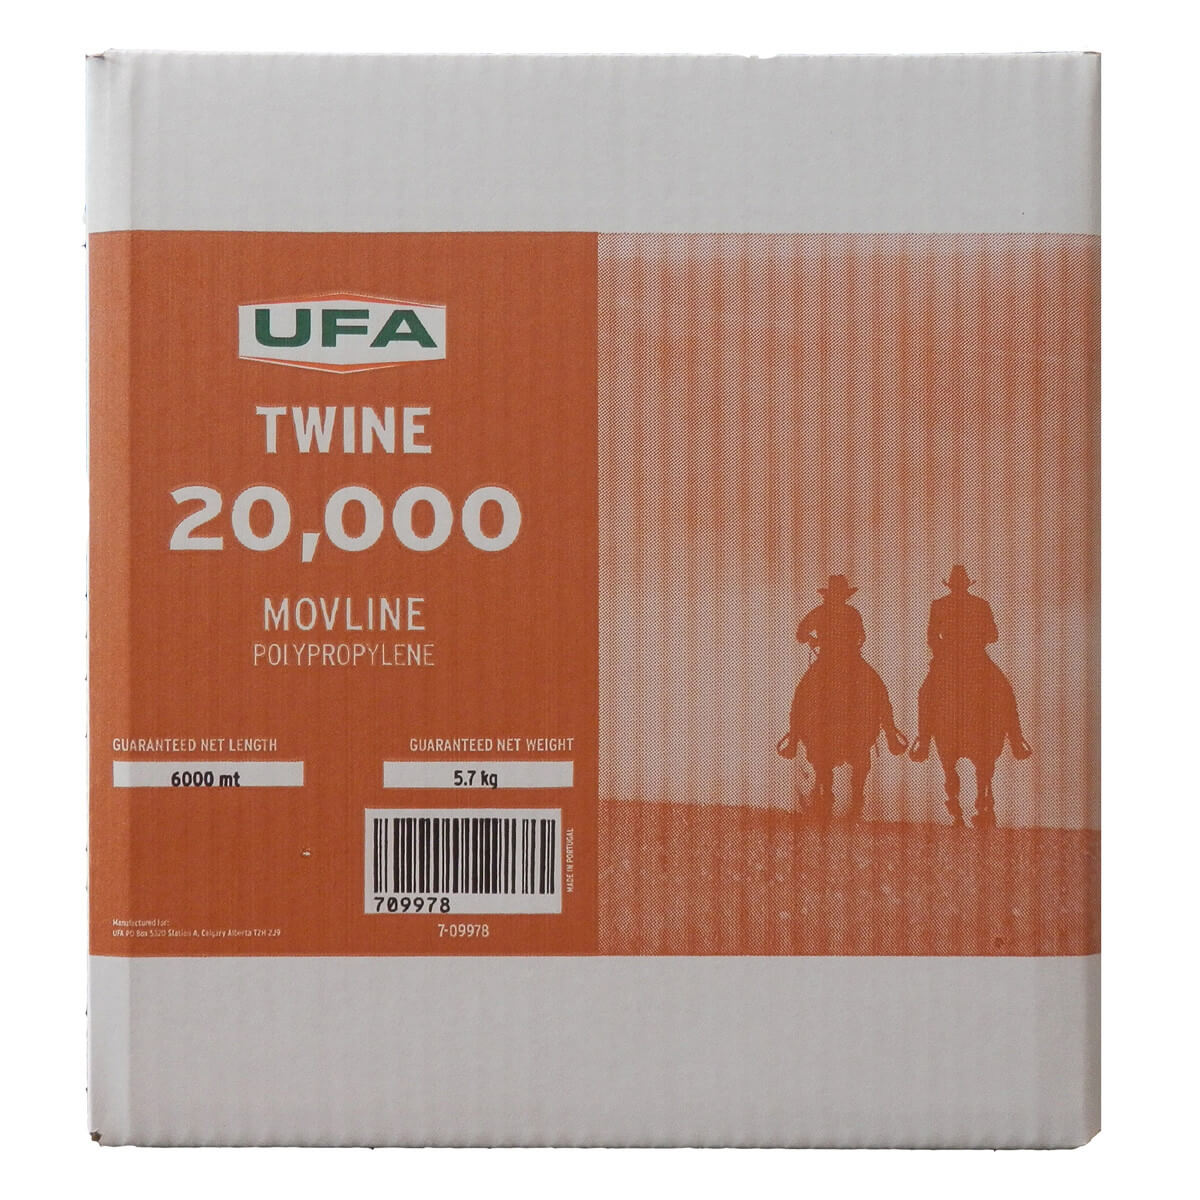 Movline Big Round Twine 20,000' - 1 spool of 20,000'